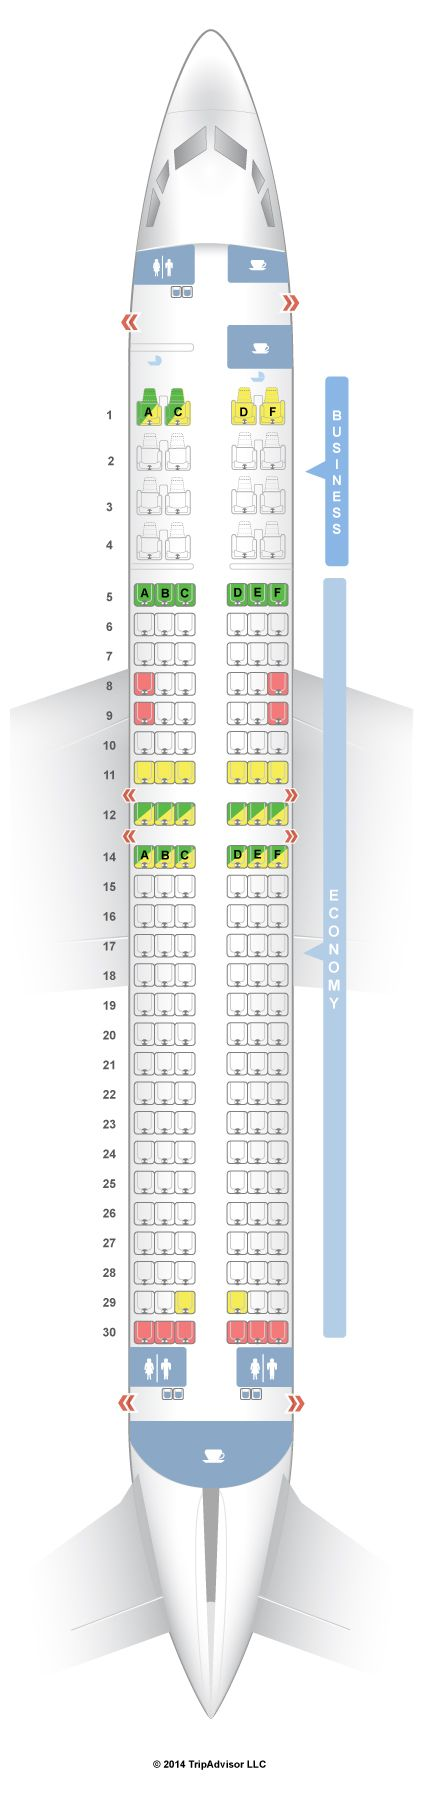 SeatGuru Seat Map Malaysia Airlines Boeing 737-800 (738) V1 - SeatGuru